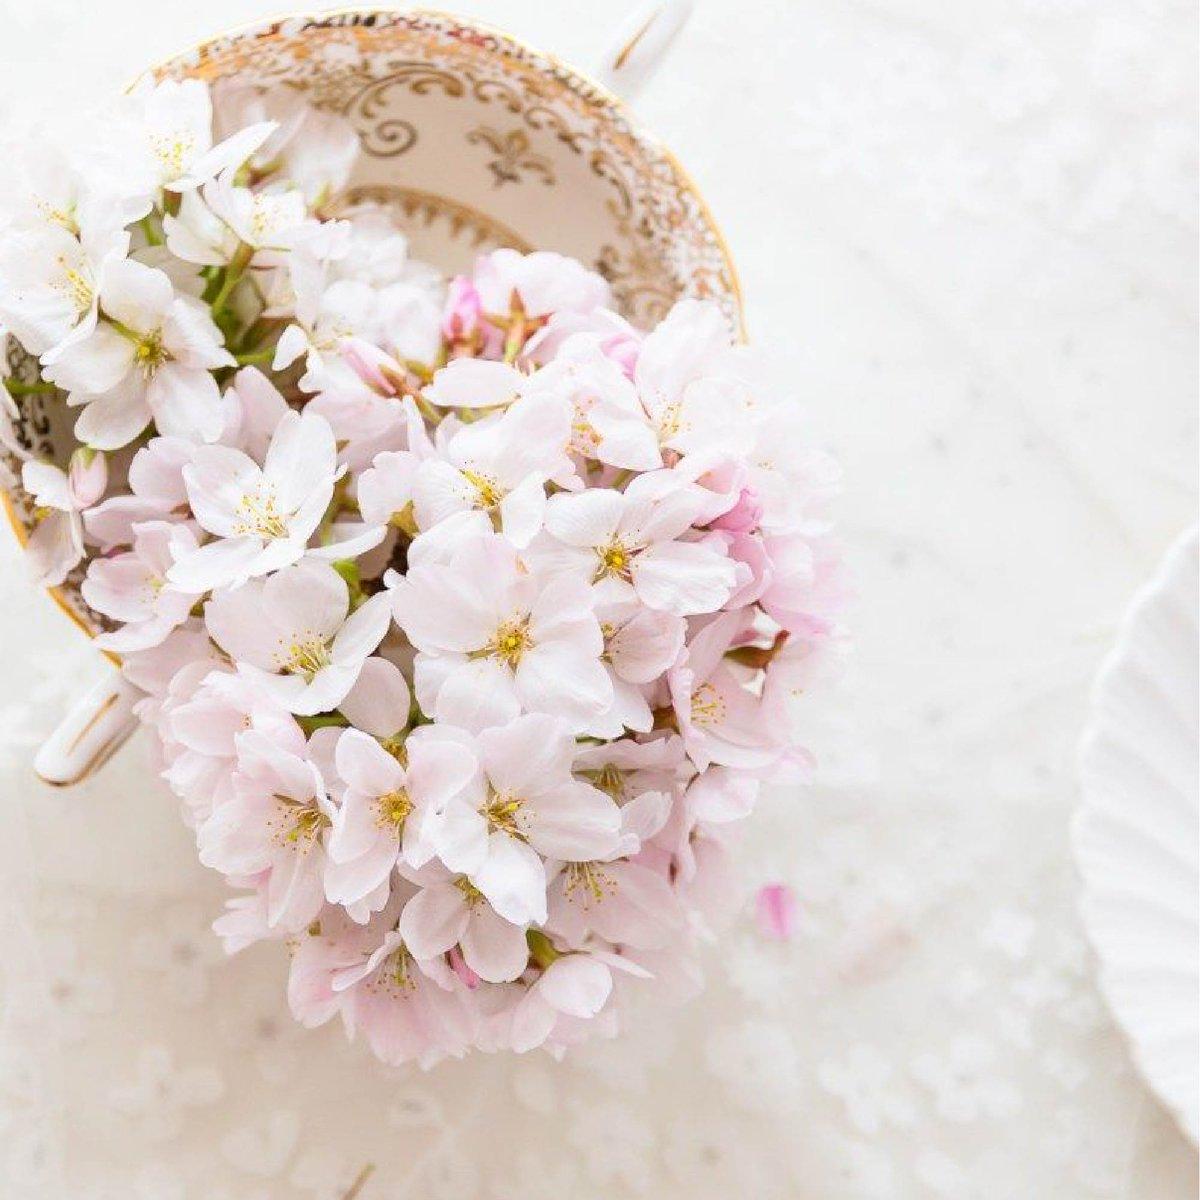 Mvenpick Hotel Karachi On Twitter Cherry Blossom Festival At